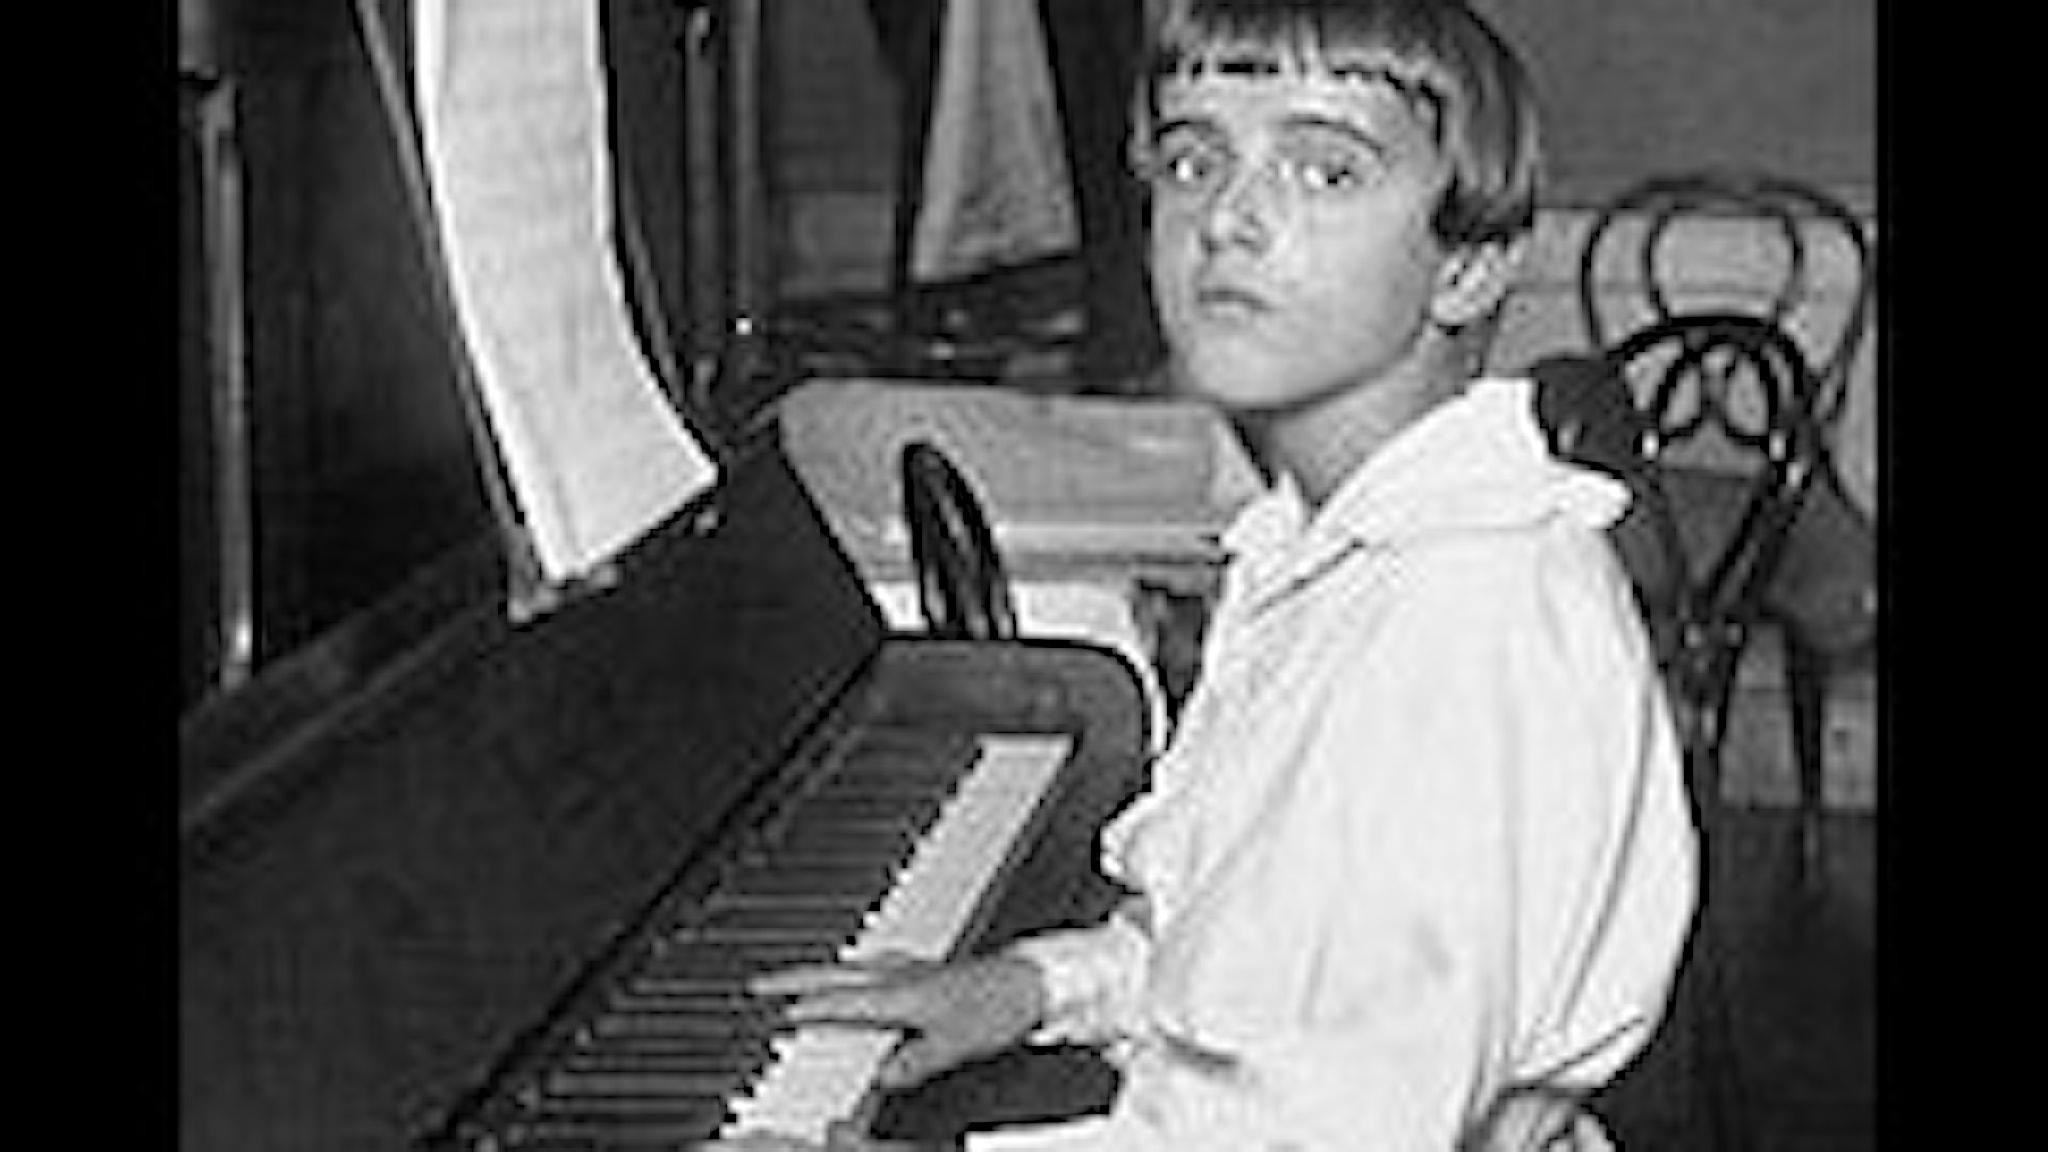 En 12 årig pojke vid pianot